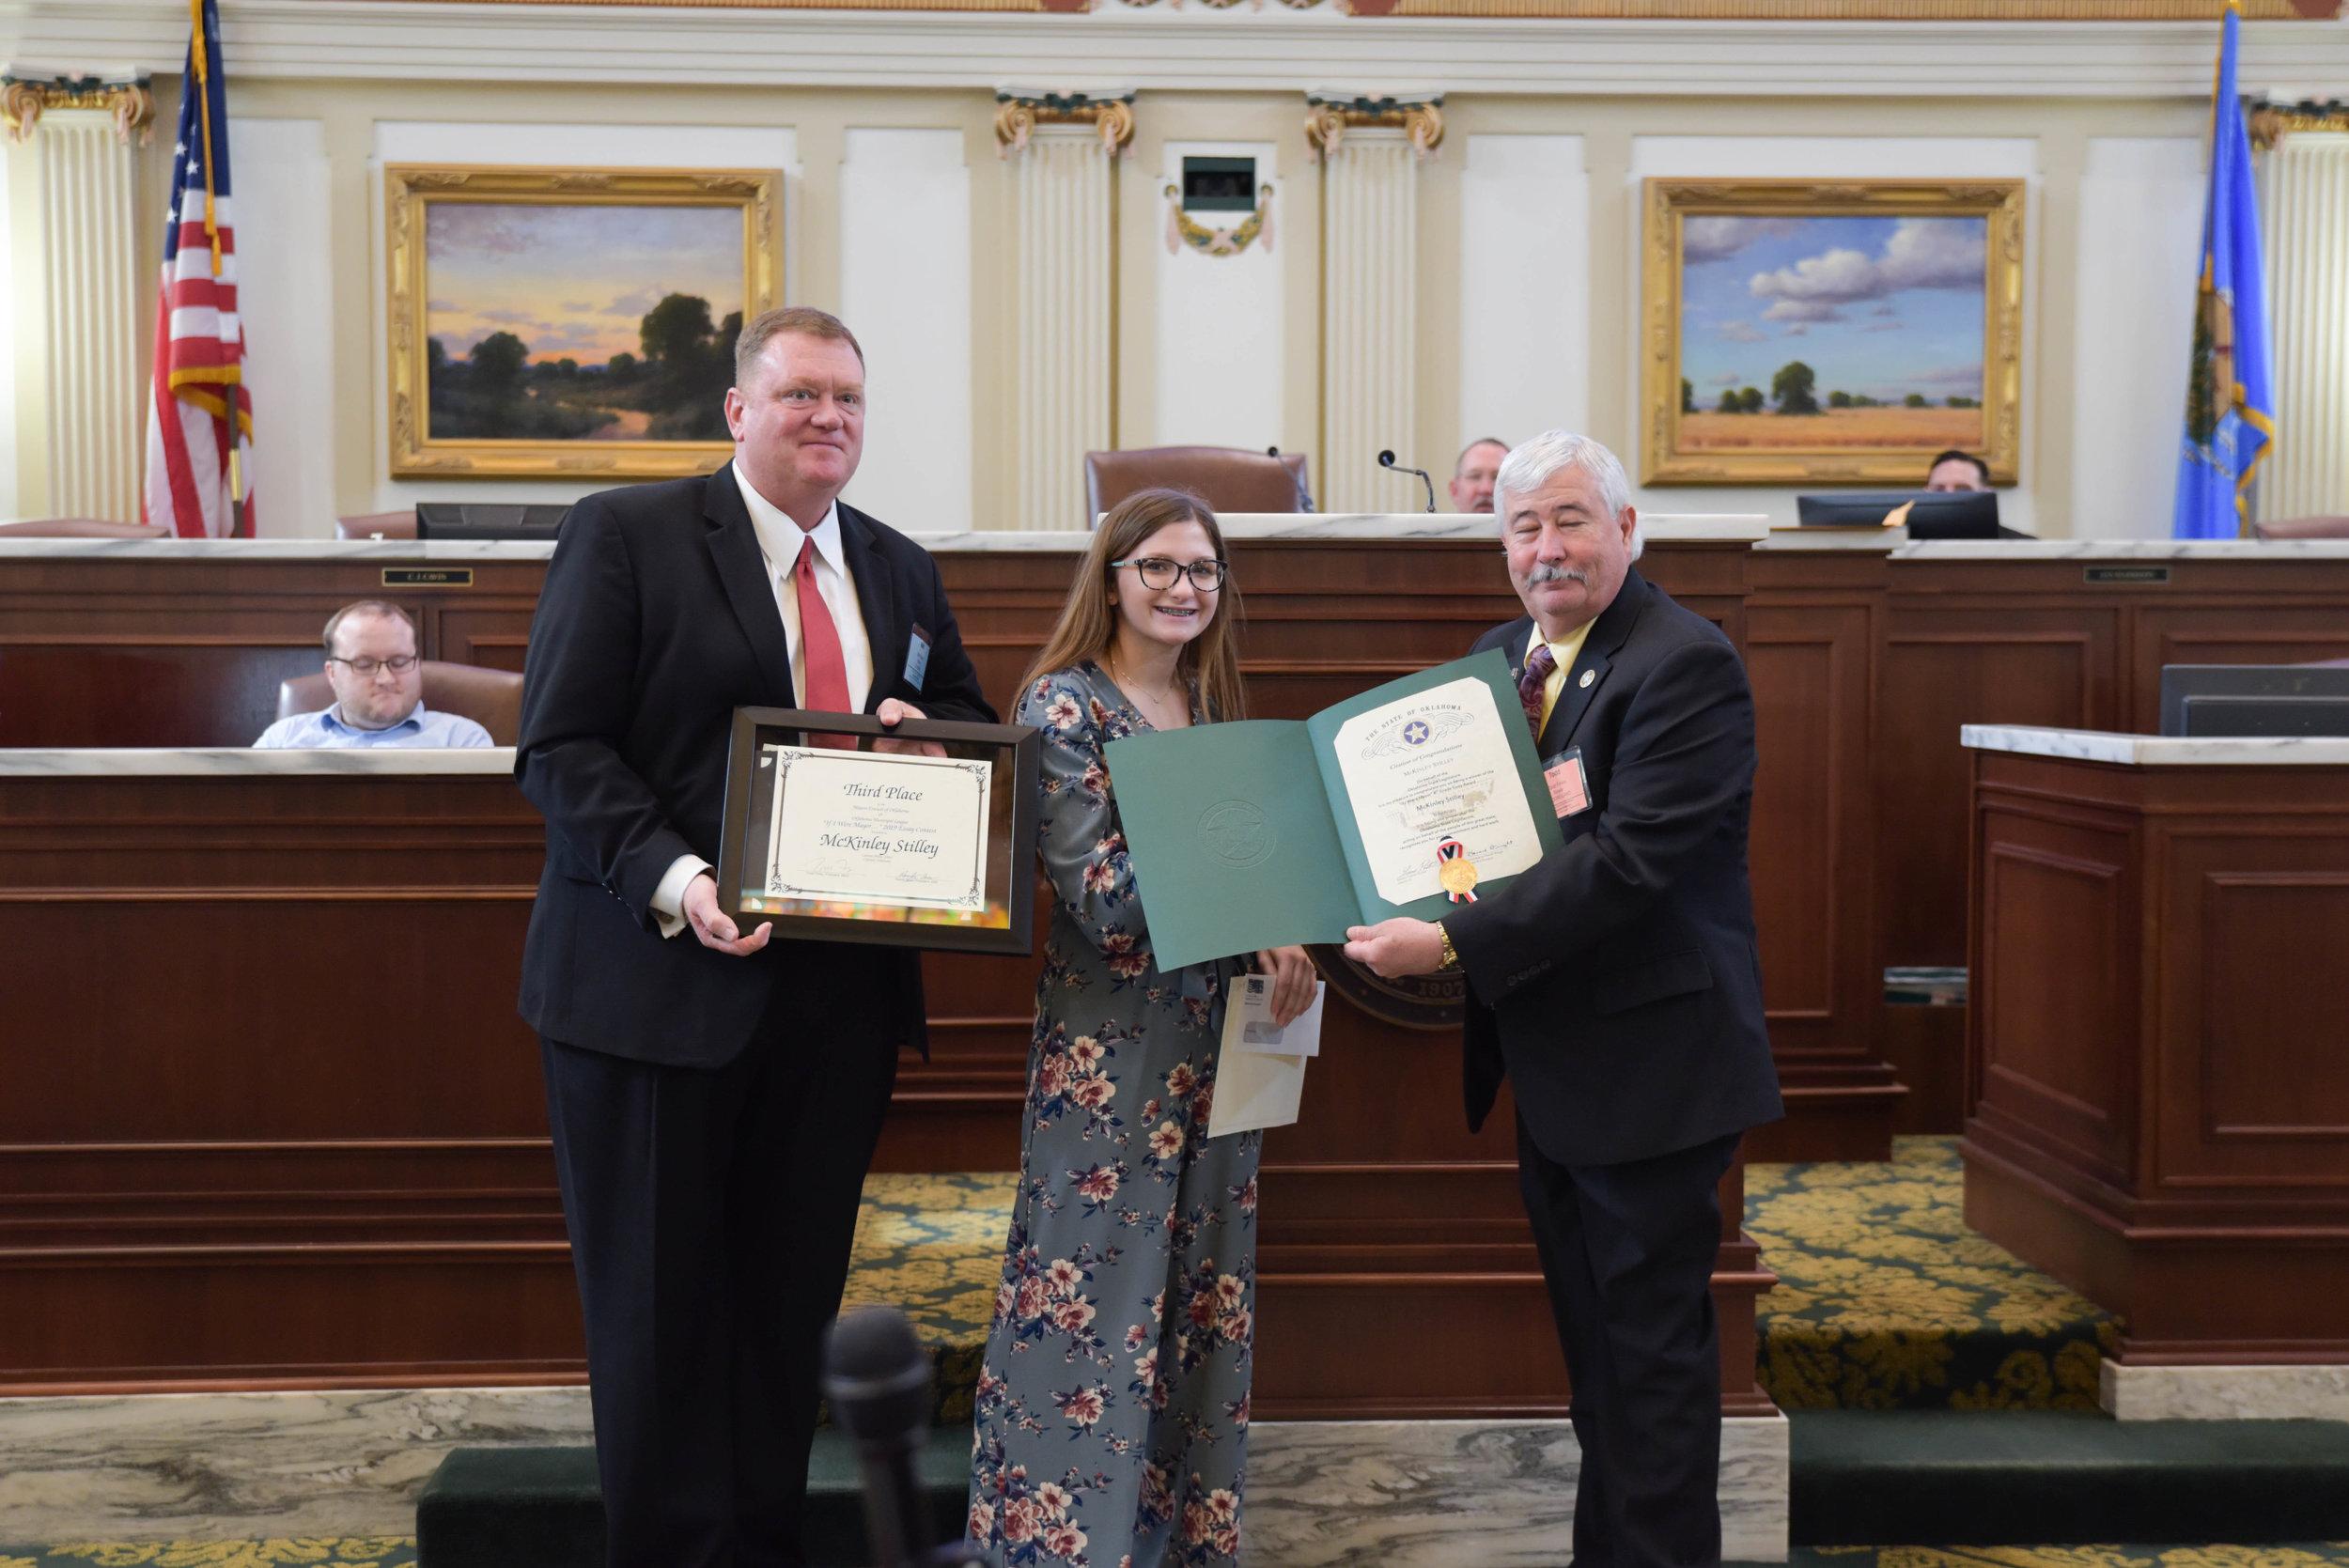 El Reno Mayor Matt White, McKinley Stilly, MCO President Todd Finley